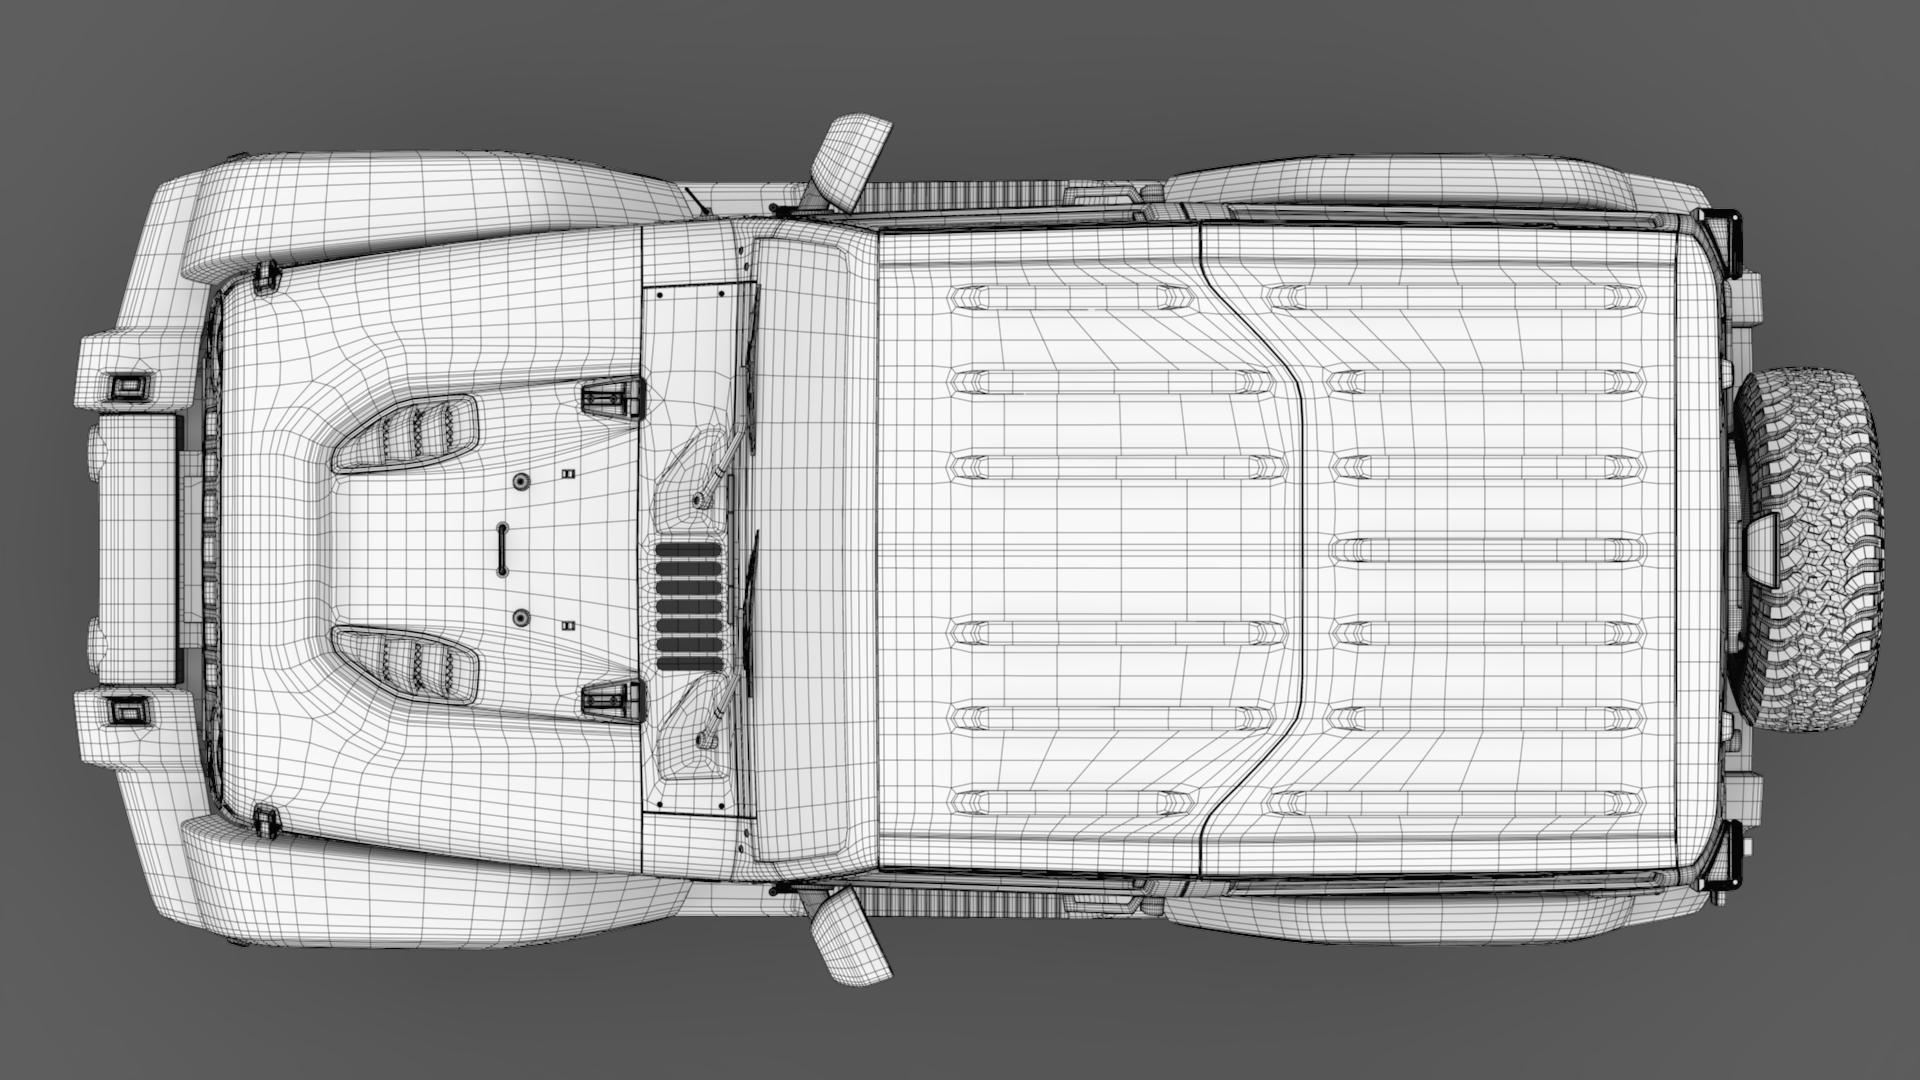 jeep wrangler chief jk 2017 3d model max fbx c4d lwo ma mb hrc xsi obj 276890